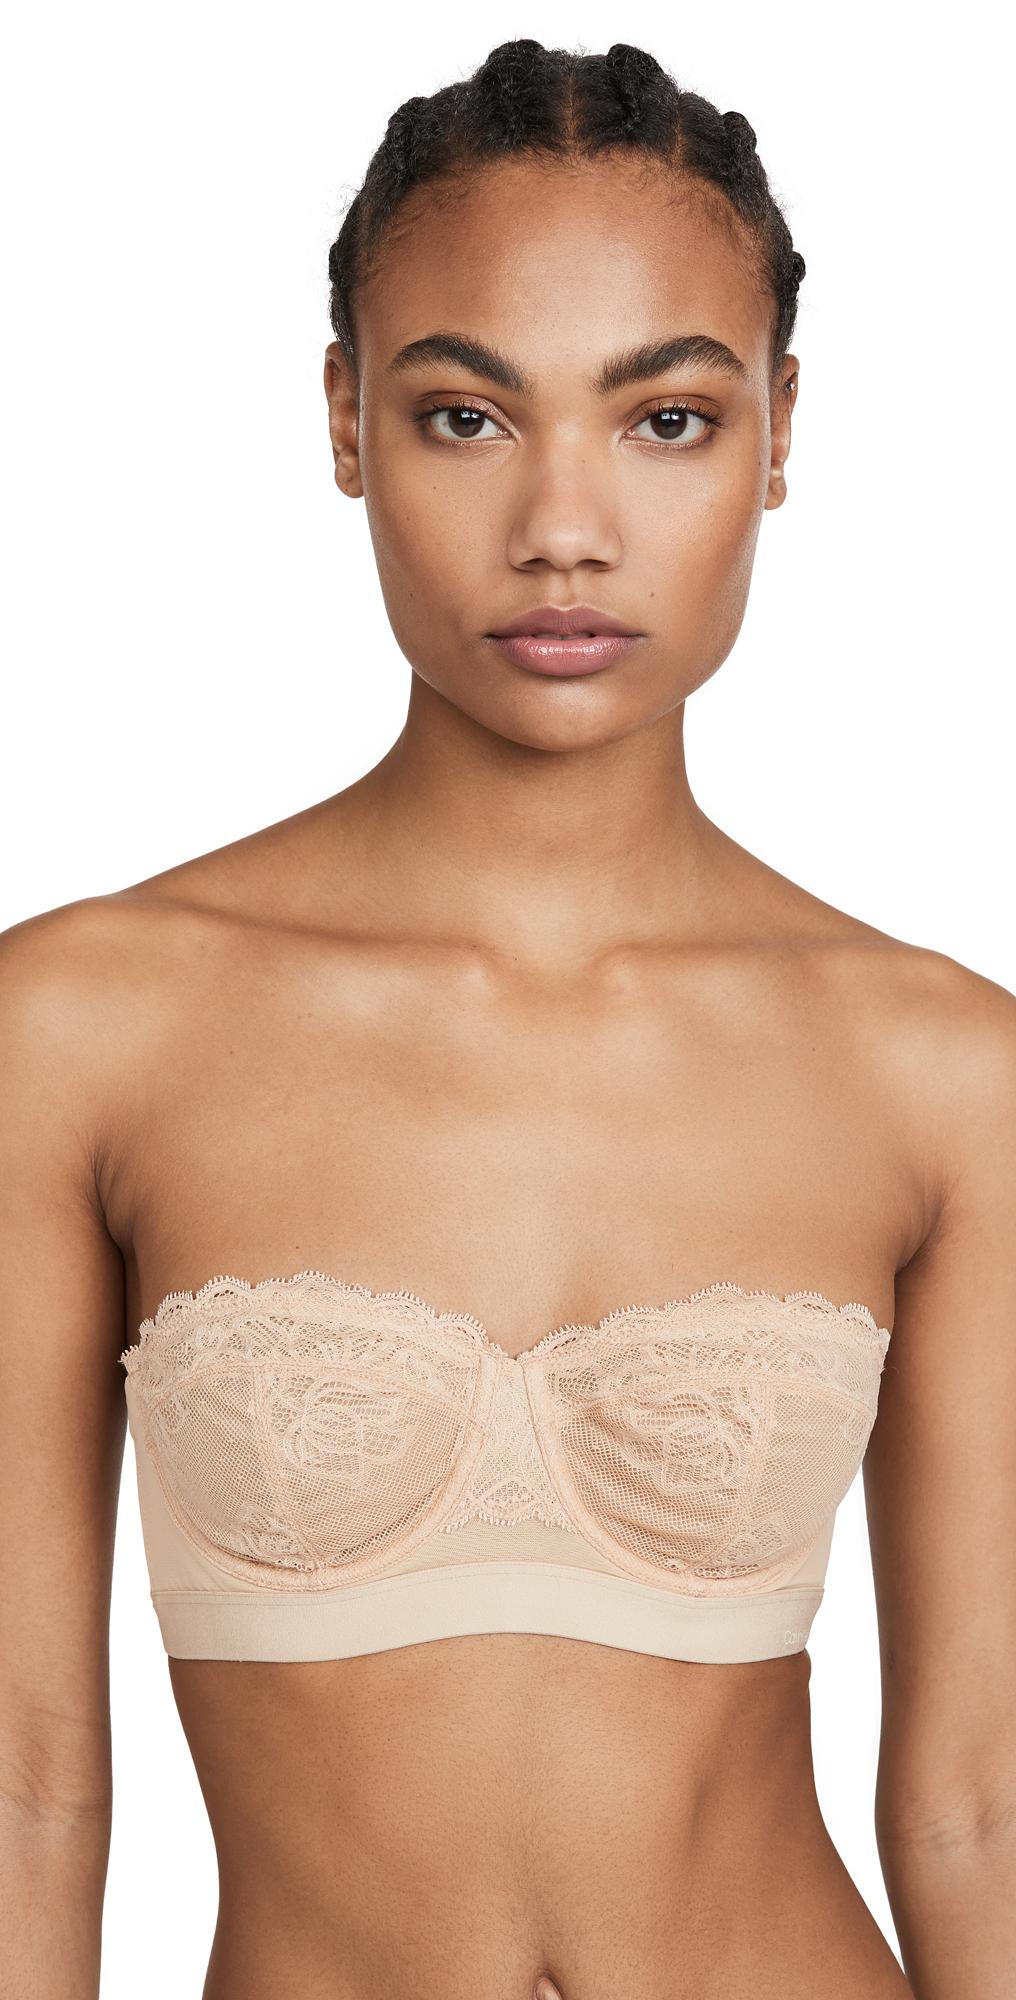 Calvin Klein Underwear Seductive Comfort Convertible Lace Padded Bra